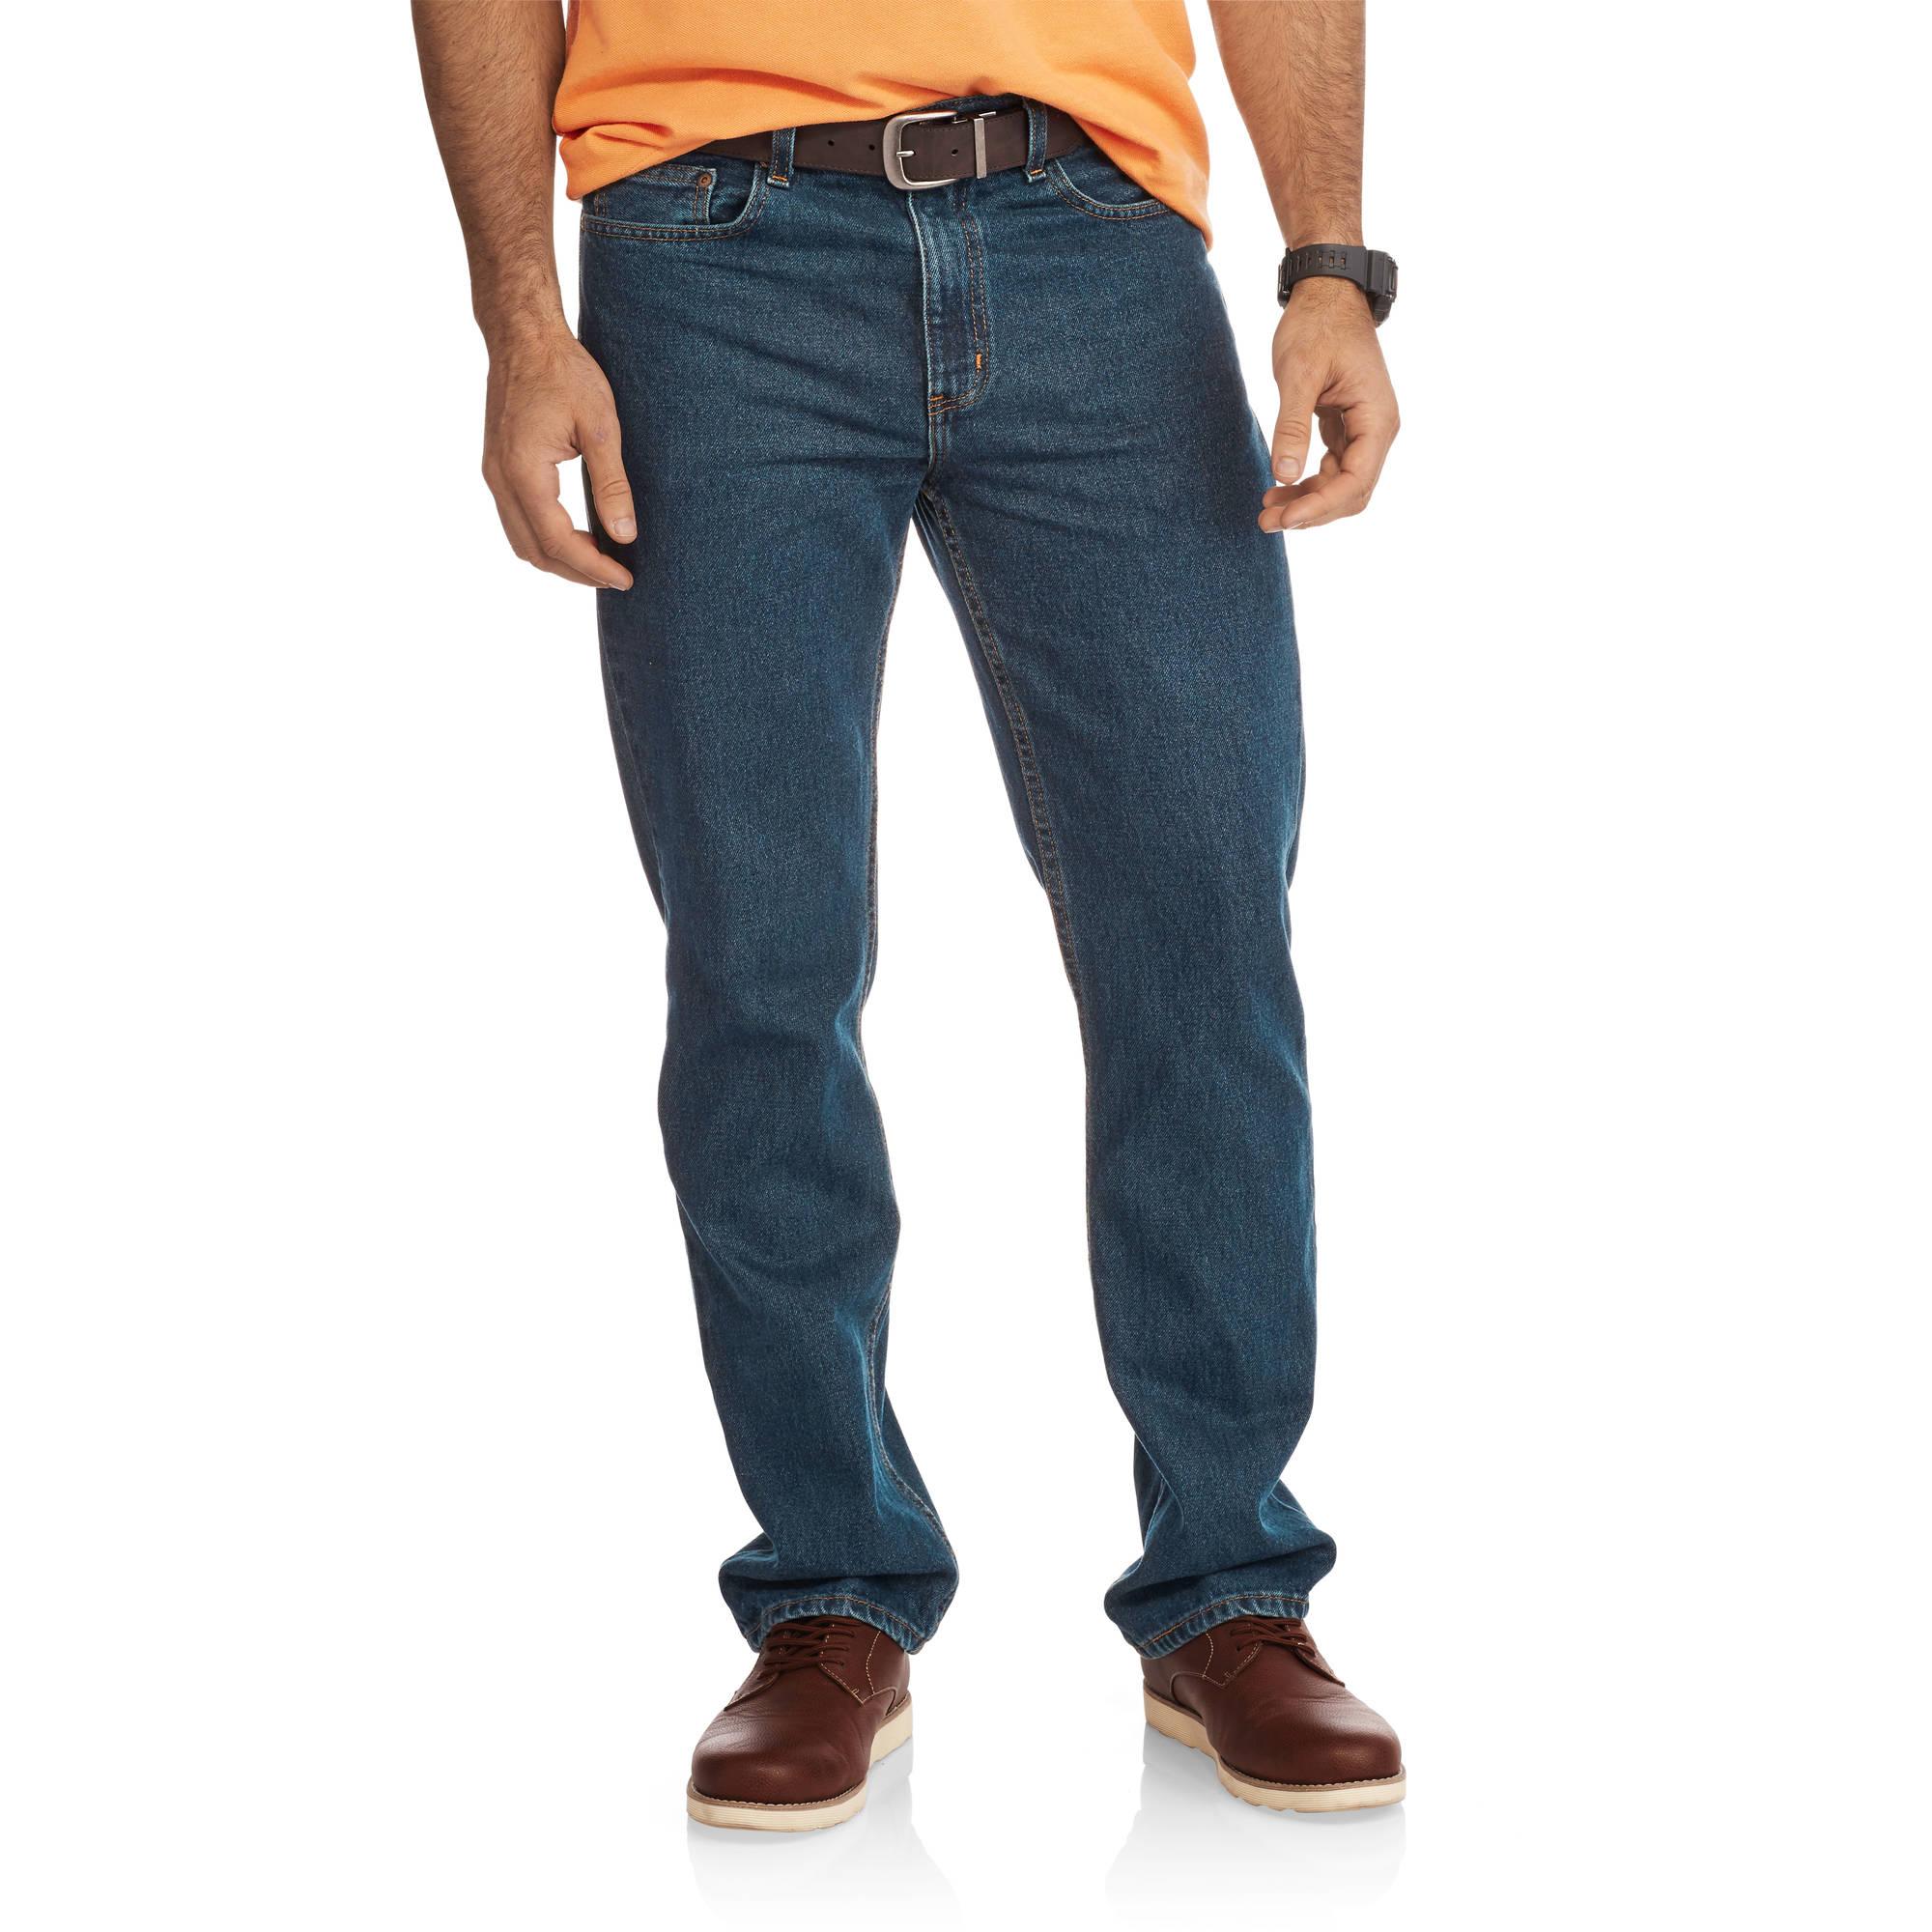 Faded Glory - Men's Original Fit Jeans